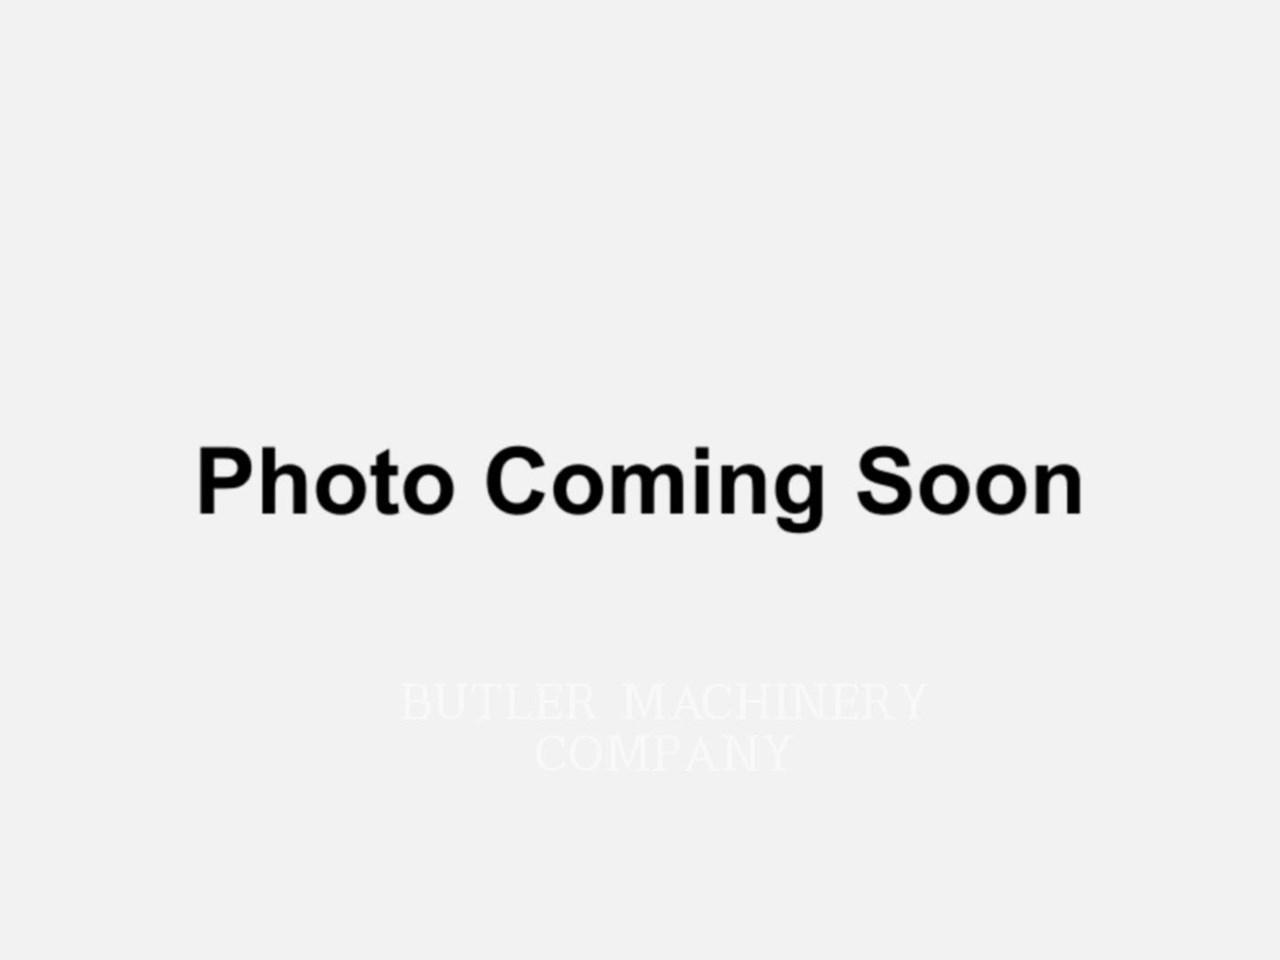 2019 Caterpillar 966 M Image 9